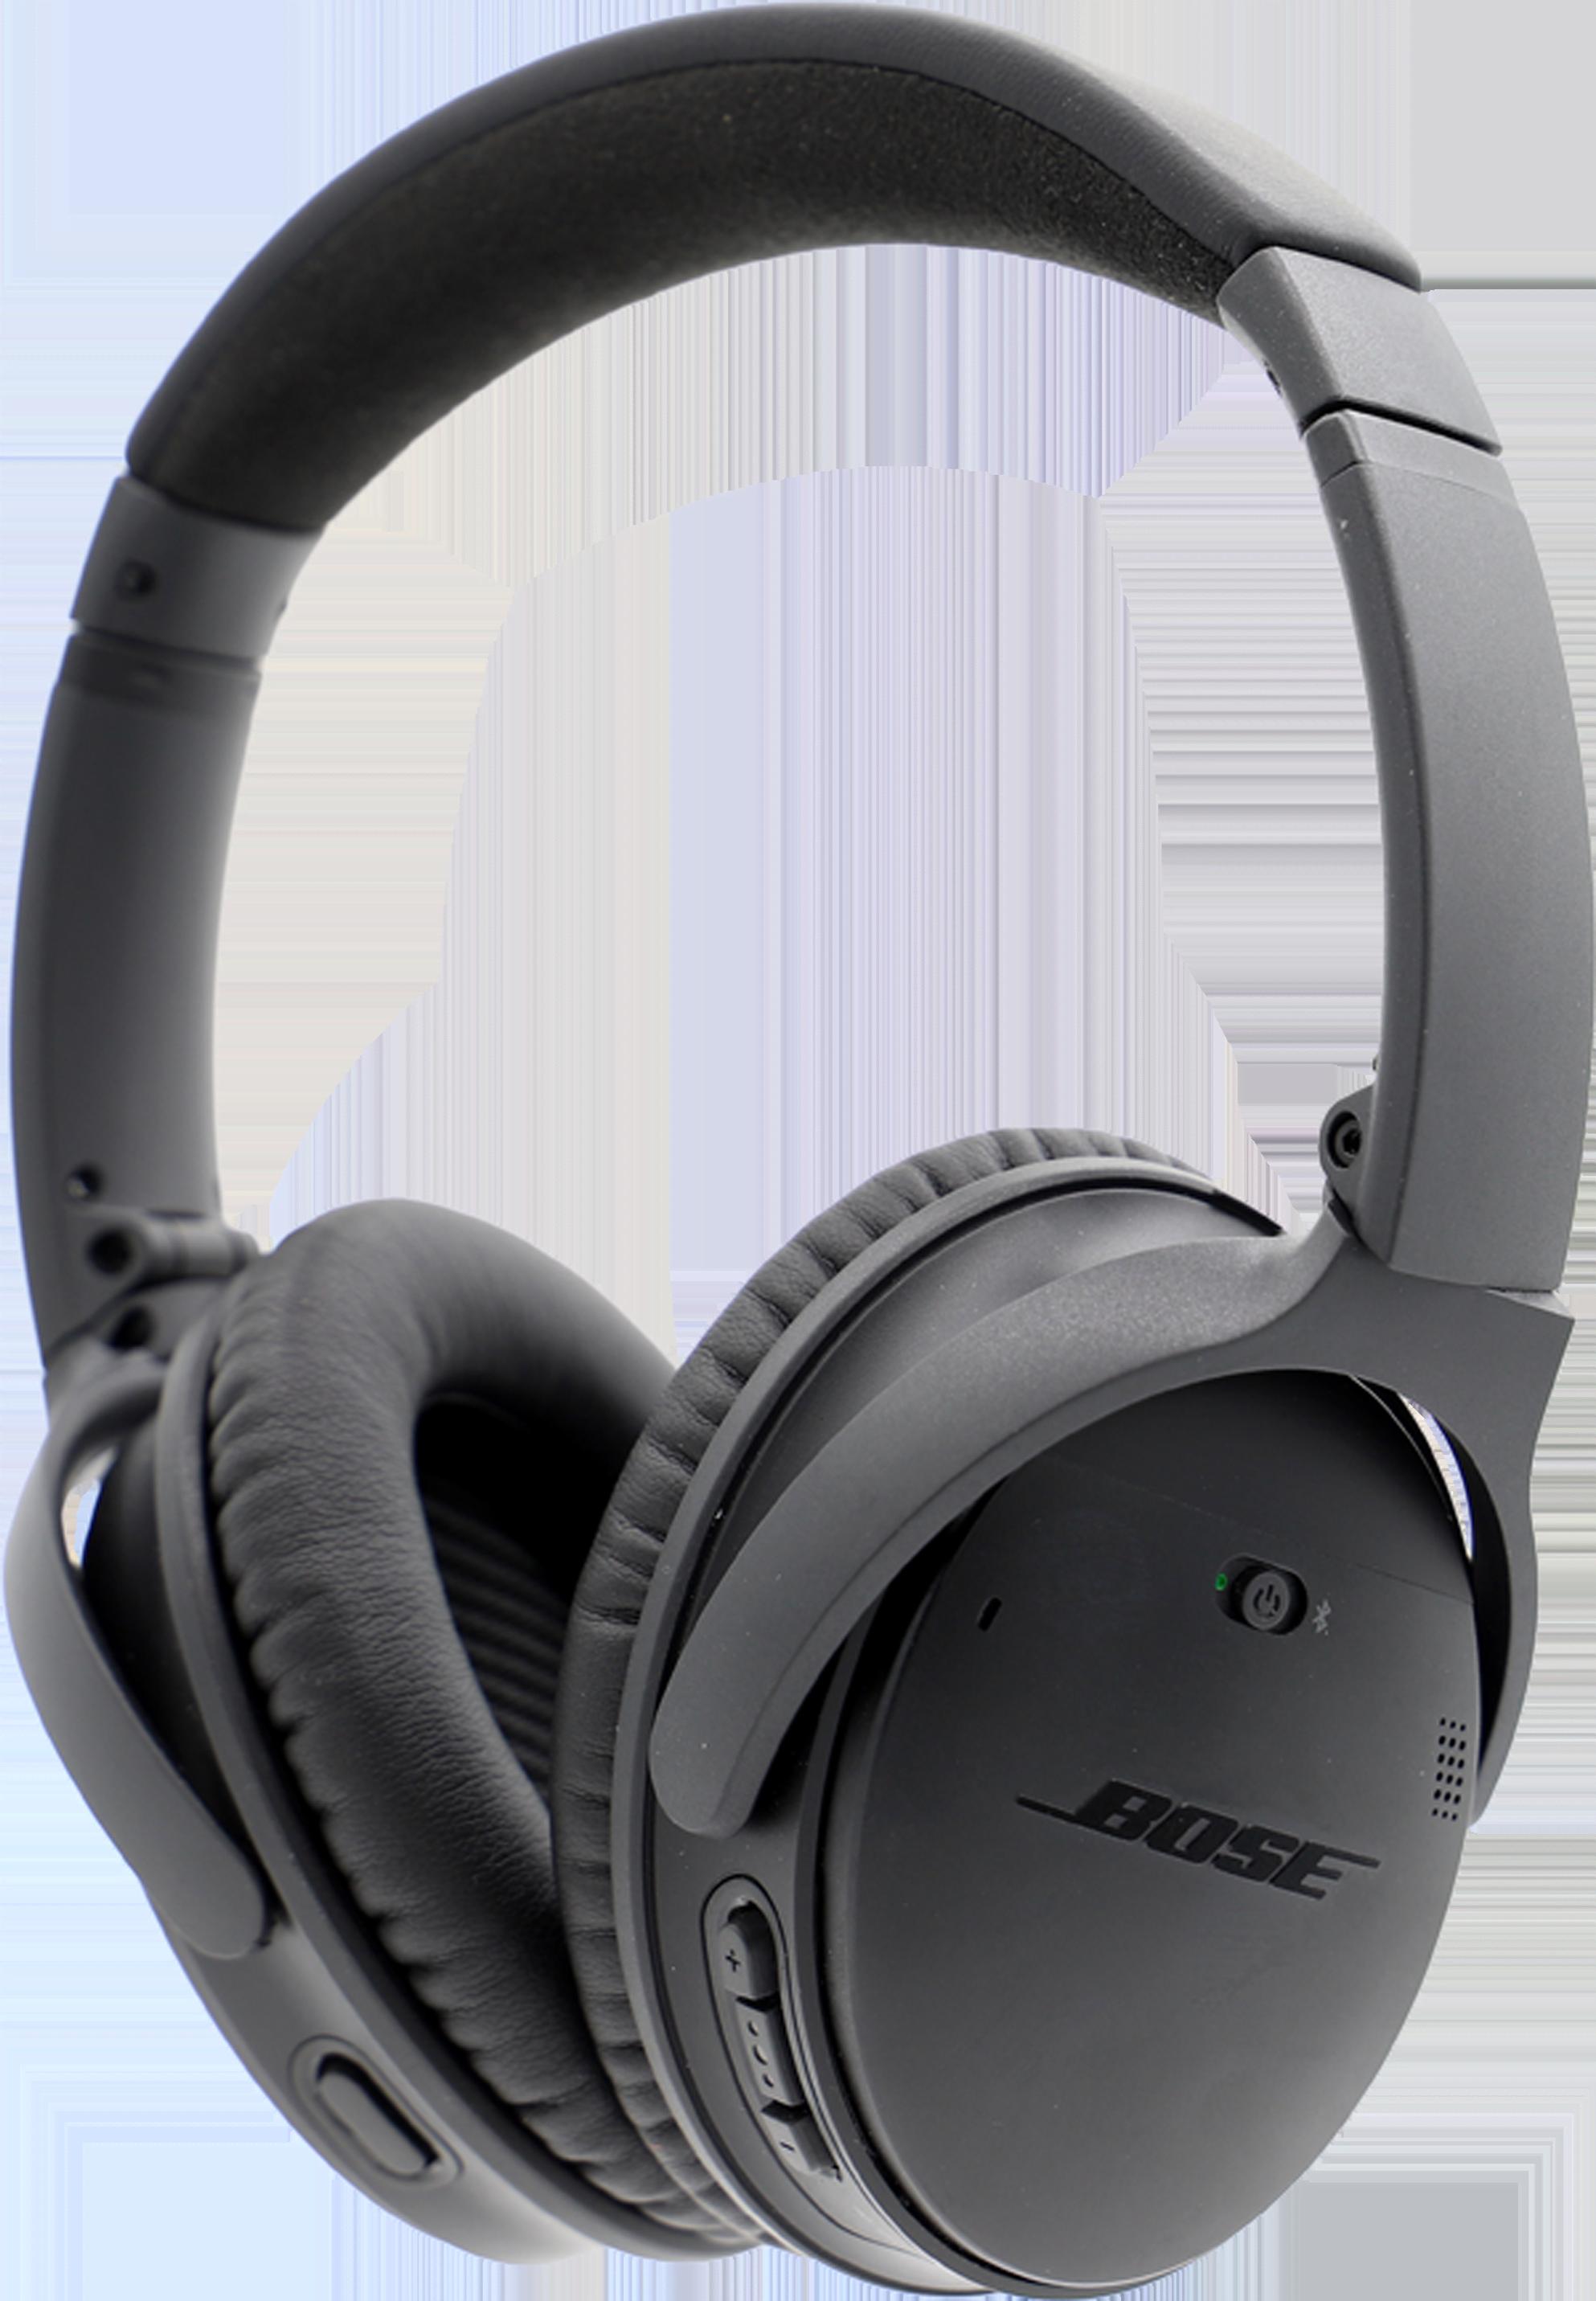 Bose Quietcomfort 35 II Noise-cancelling Over-ear Bluetooth Headphones